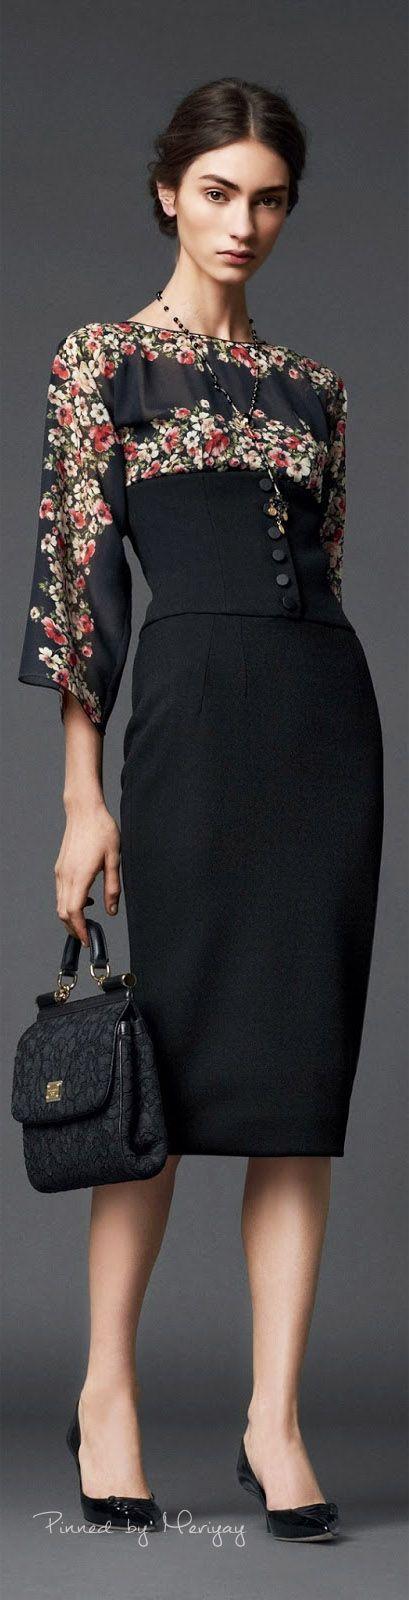 Dolce & Gabbana. Beautifuls.com Members VIP Fashion Club 40-80% Off Luxury…